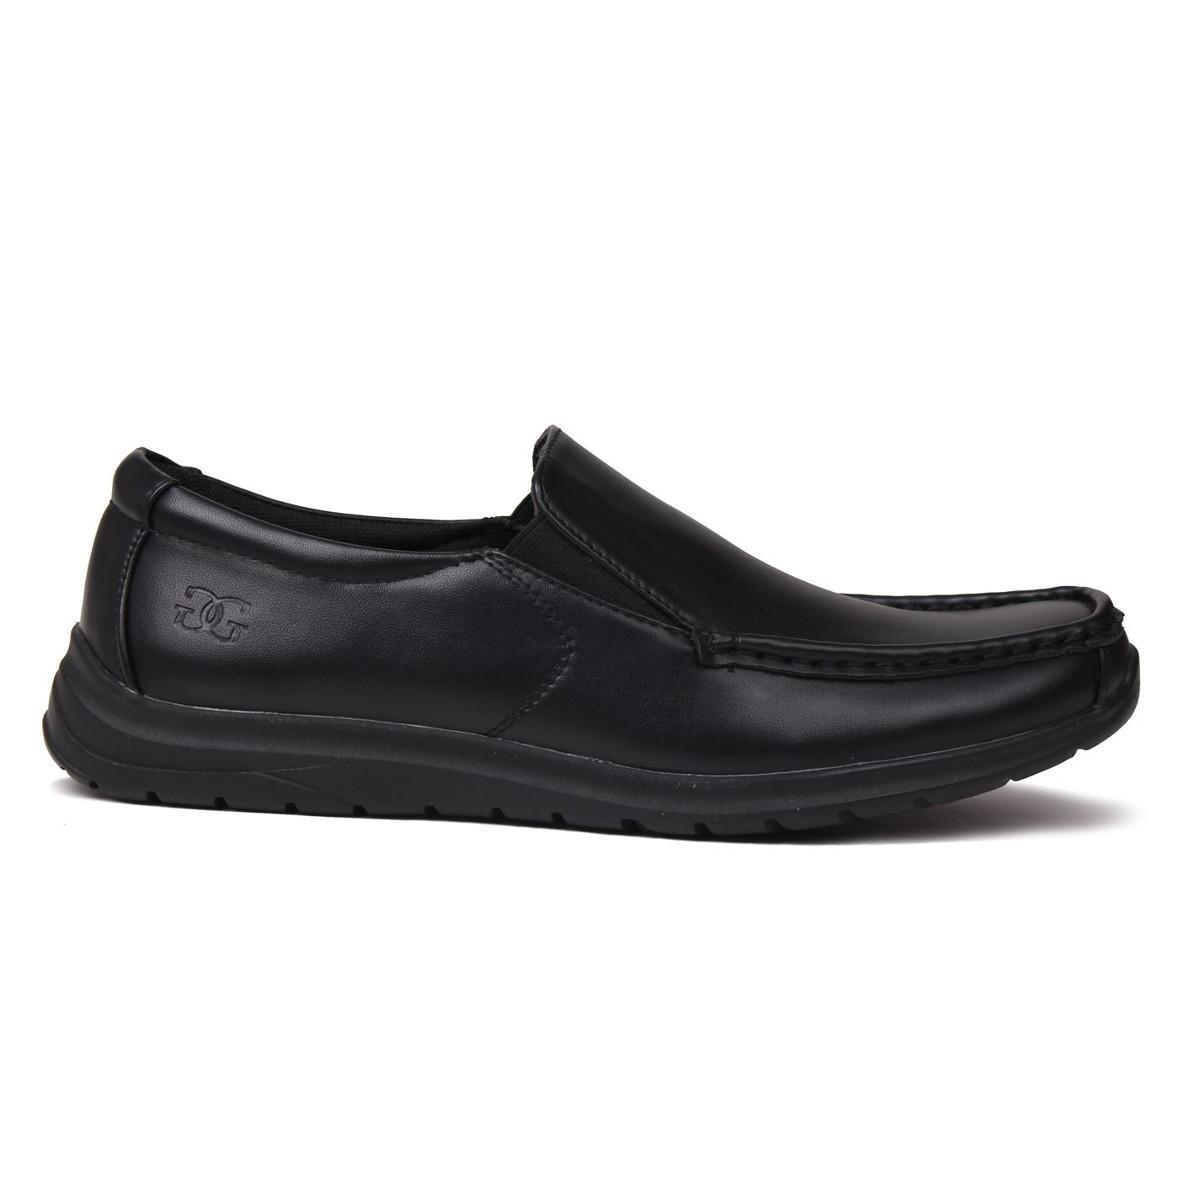 Giorgio Boys' Bexley Slip-On Casual Shoes - Black, 6